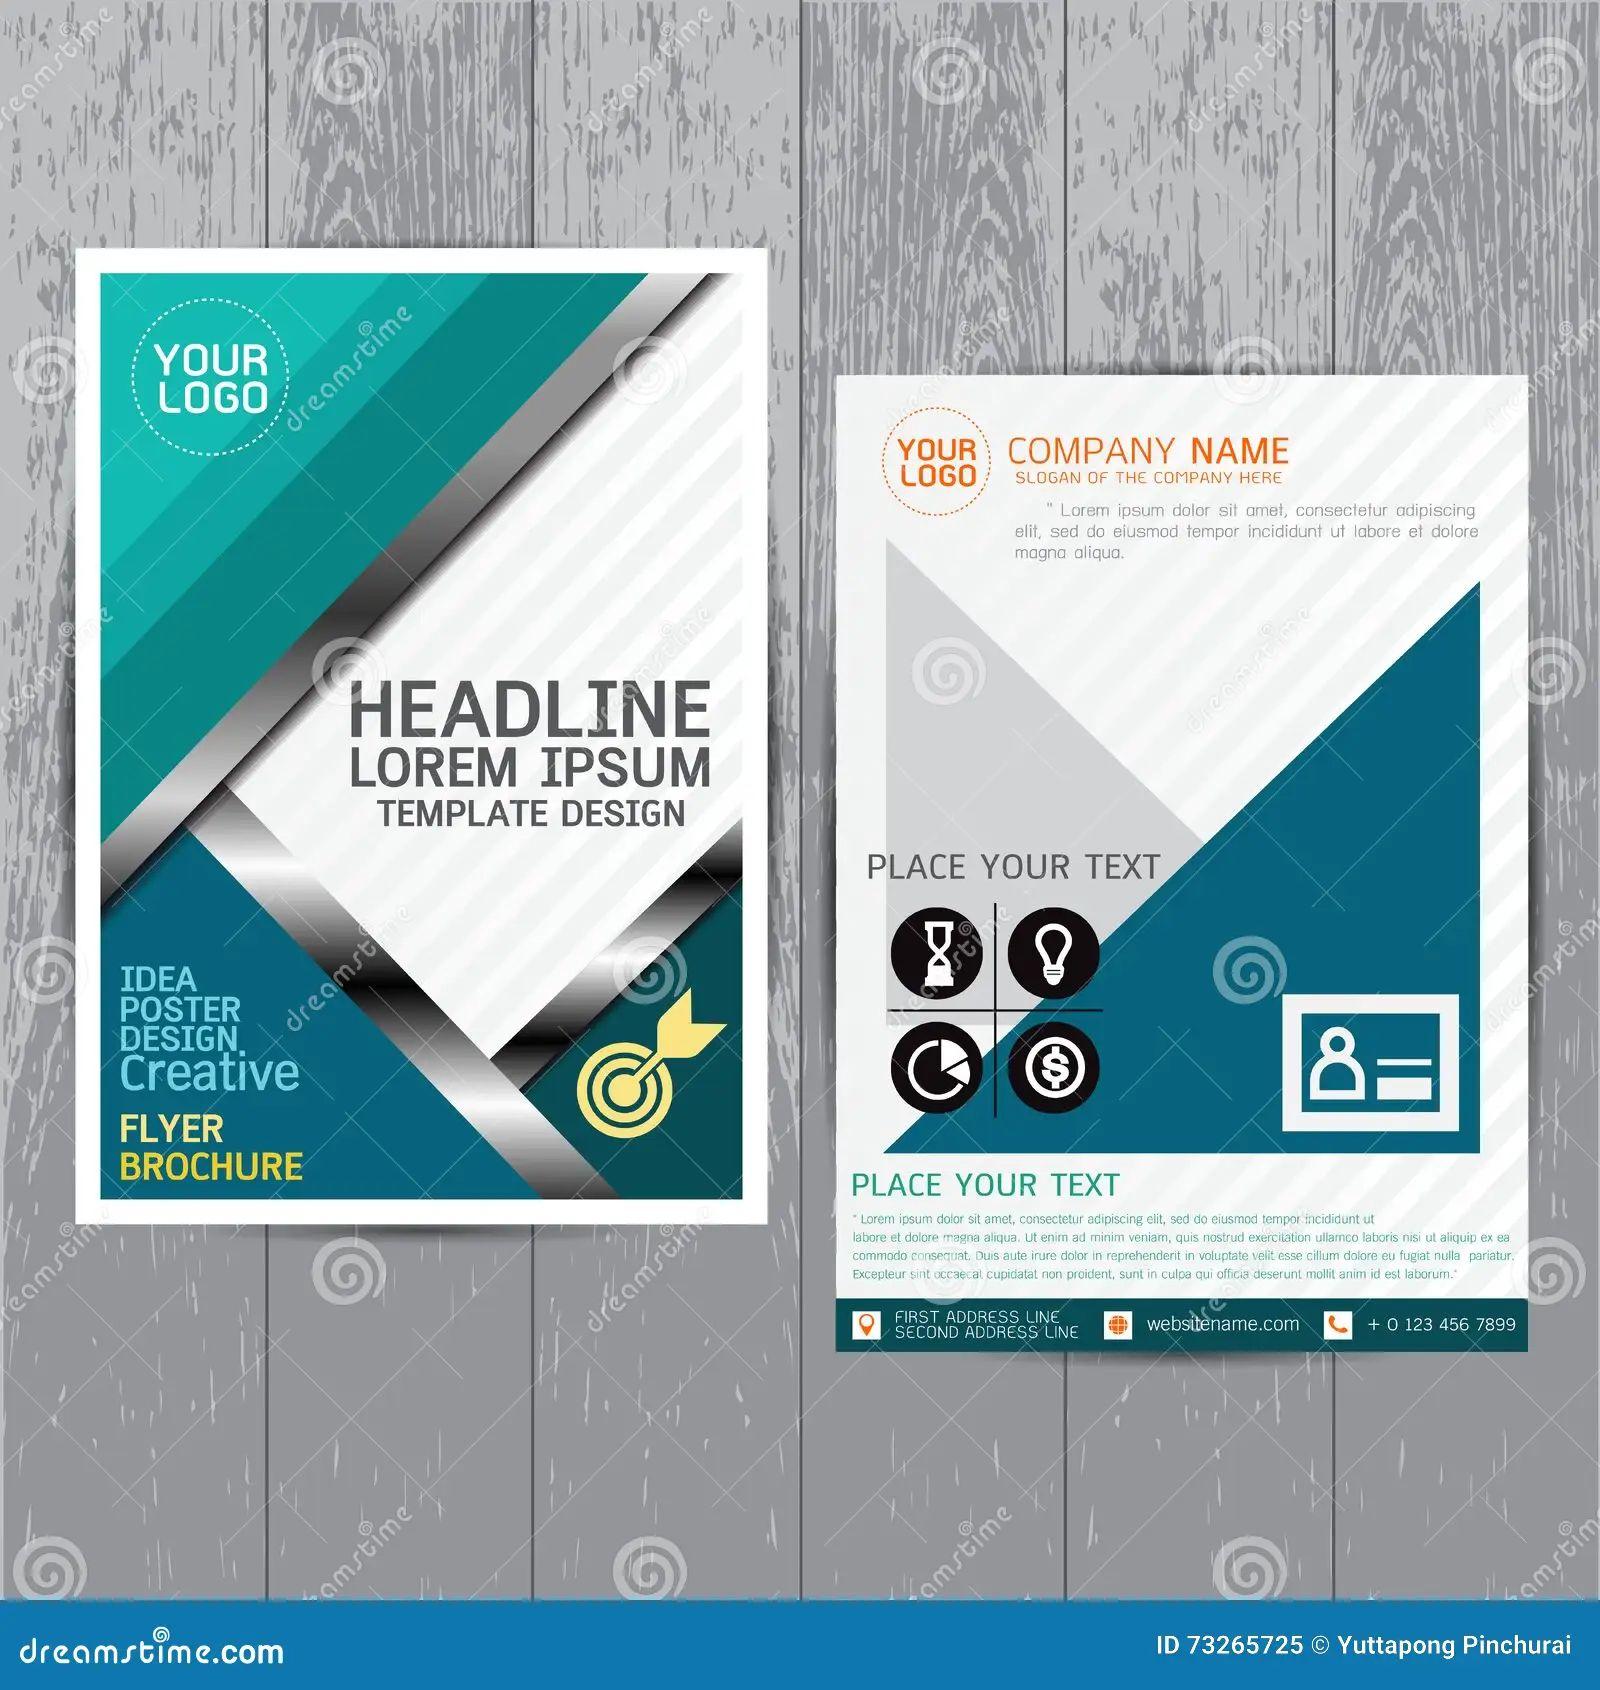 Poster design layout - Download